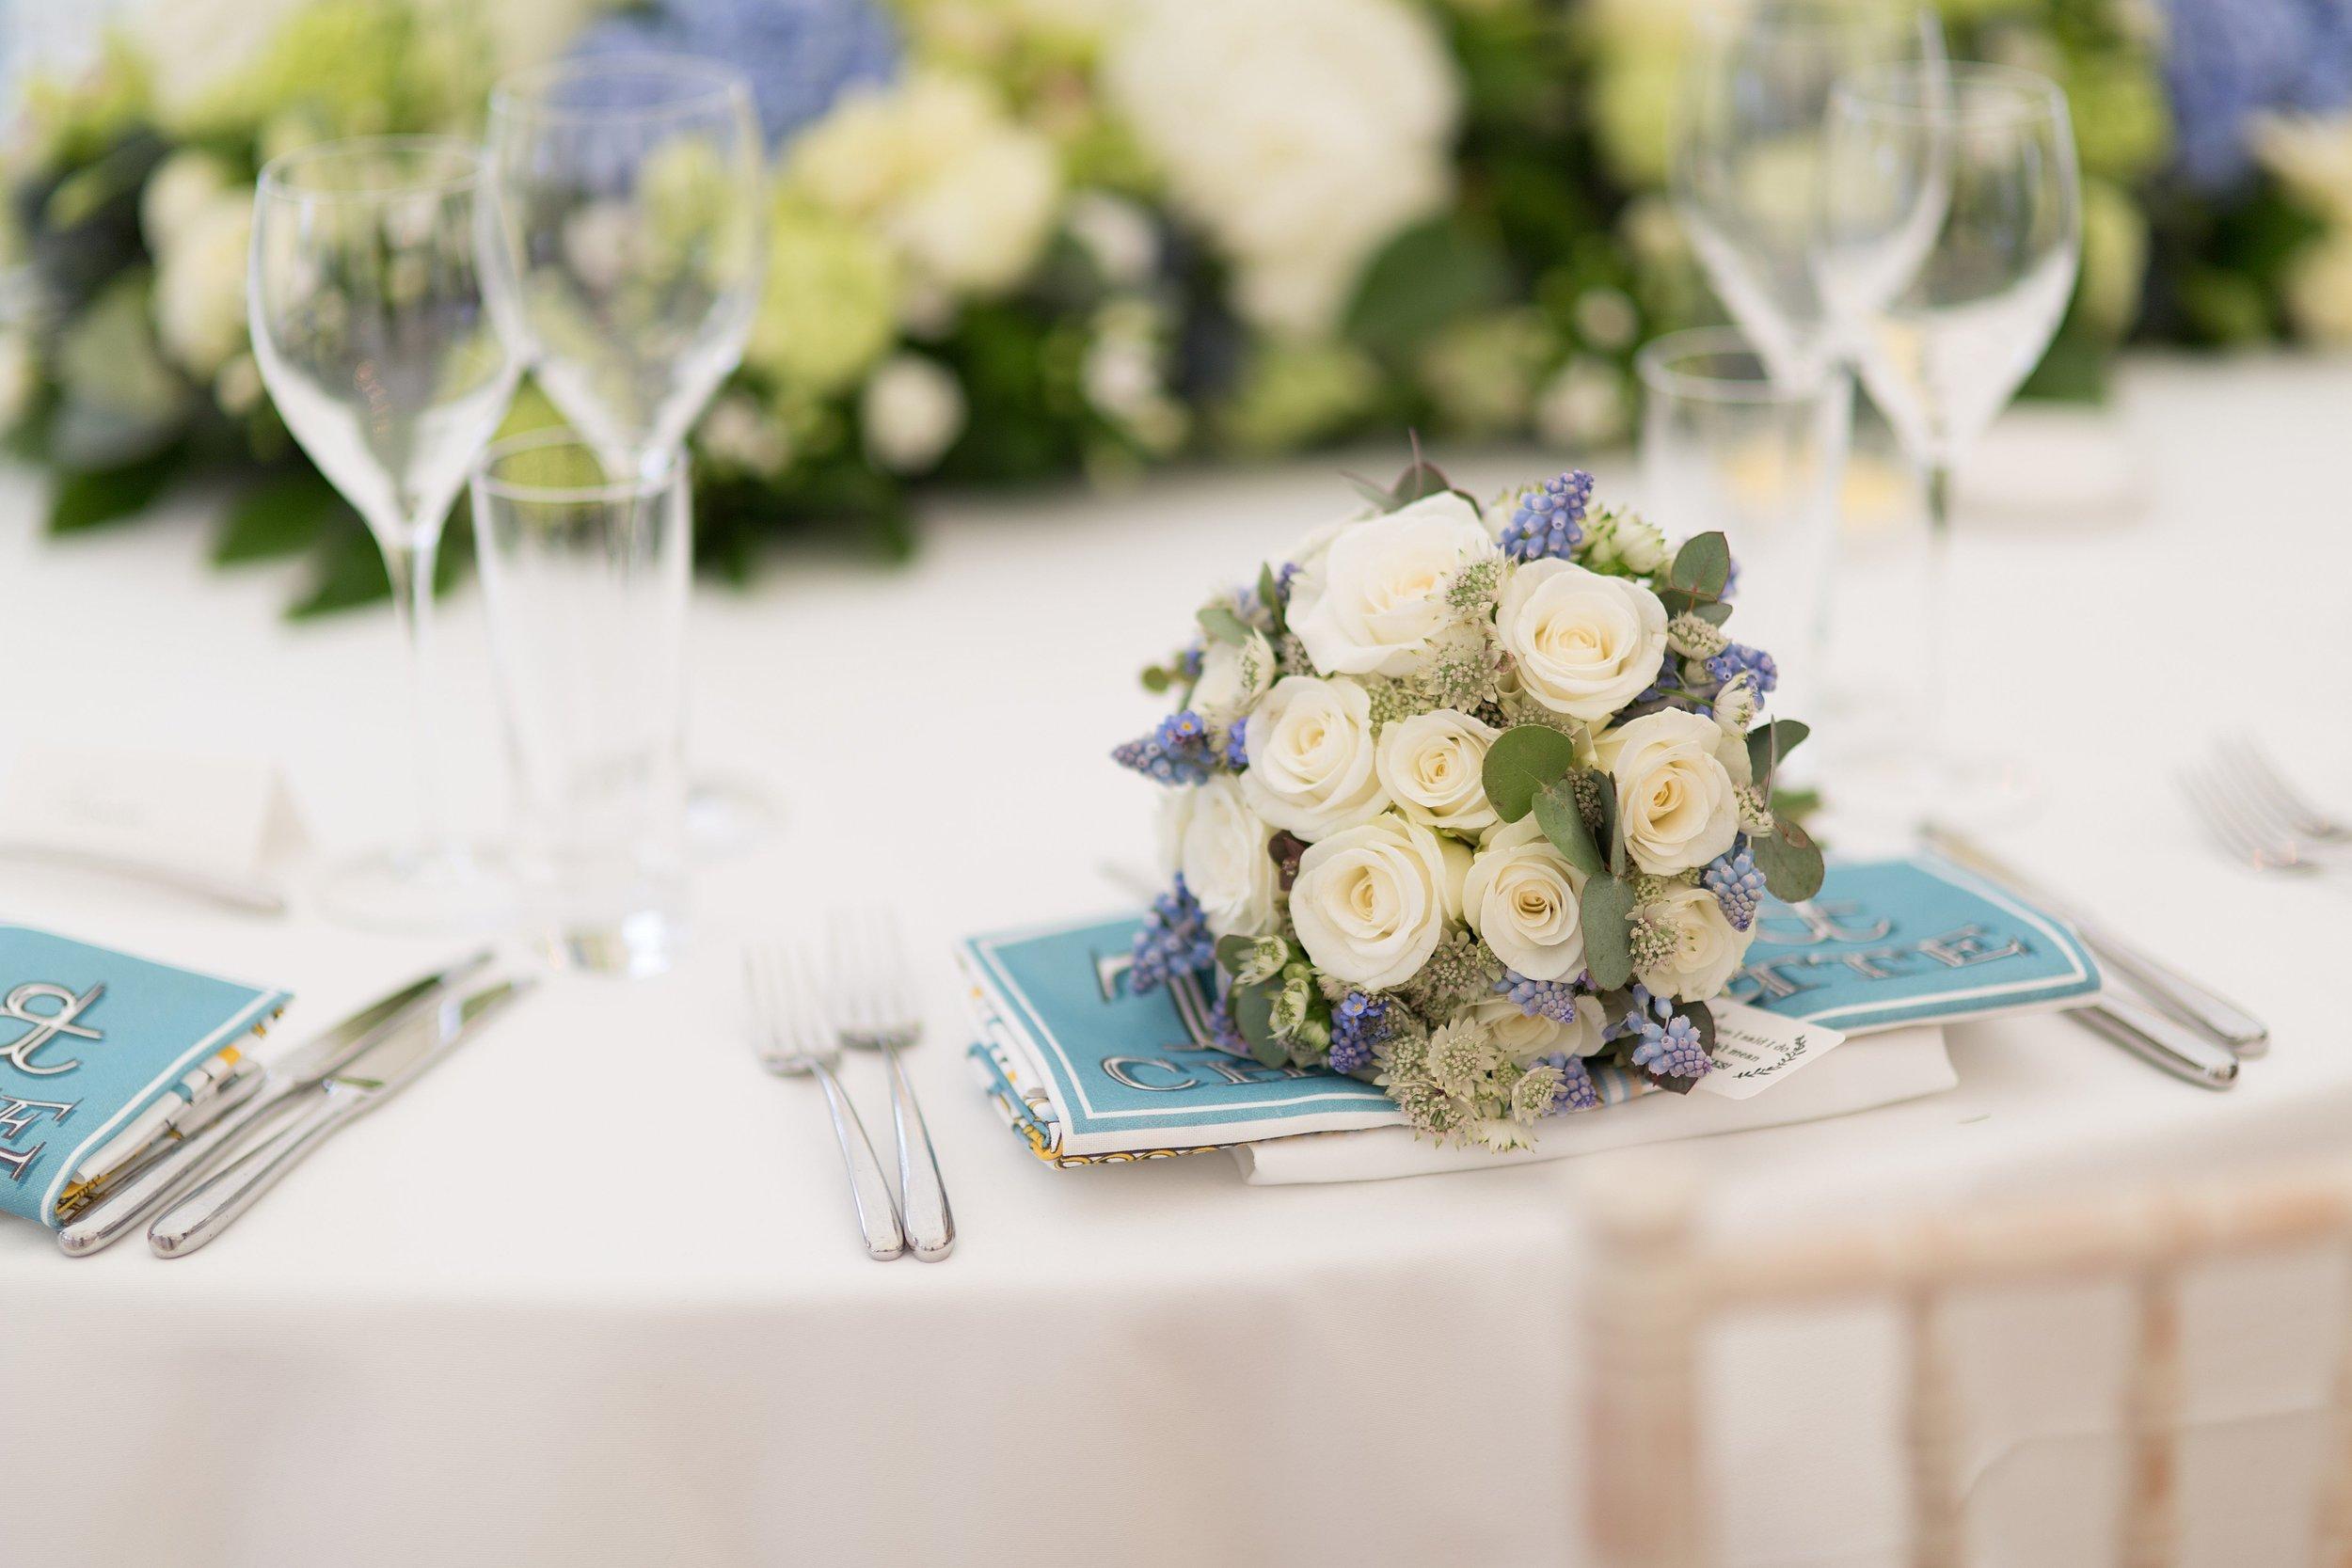 BOUQUET_BRIDE_ROSE_MIRIAM_FAITH_WEDDING_FLOWERS.jpg